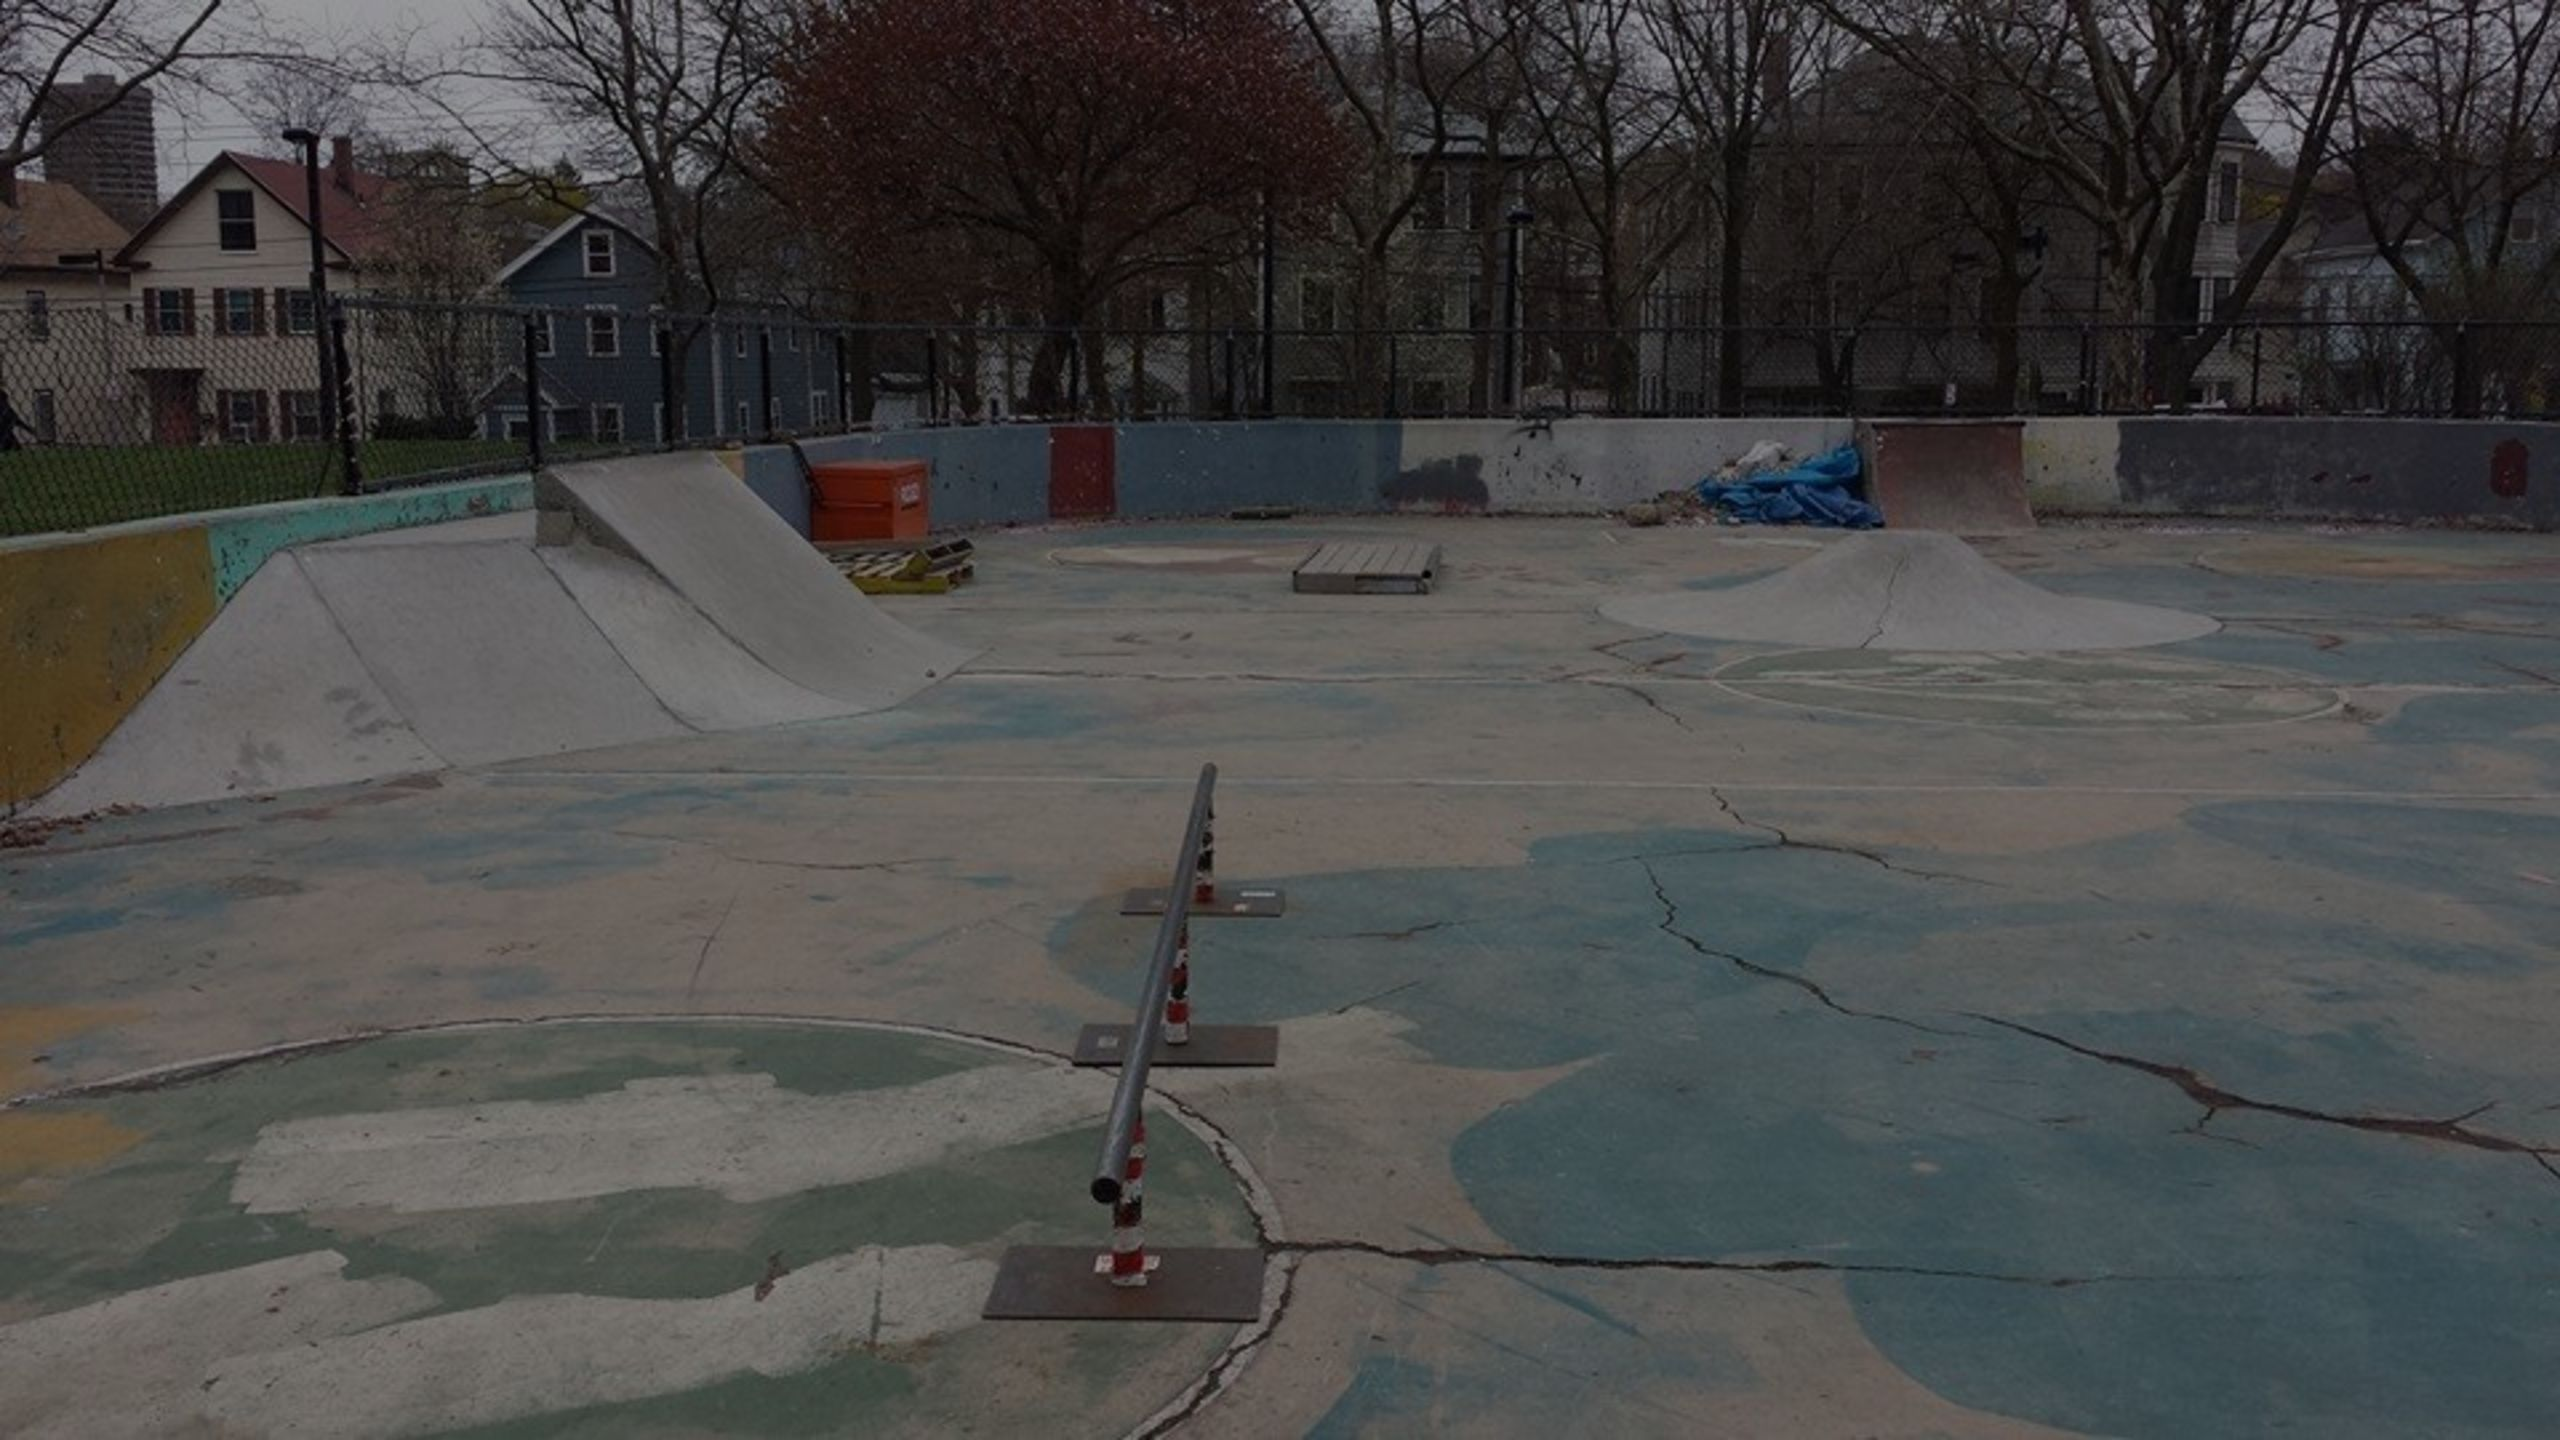 DCR, Converse, Wheels of Steel Provide $75K to Renovate JP Skateboard Park